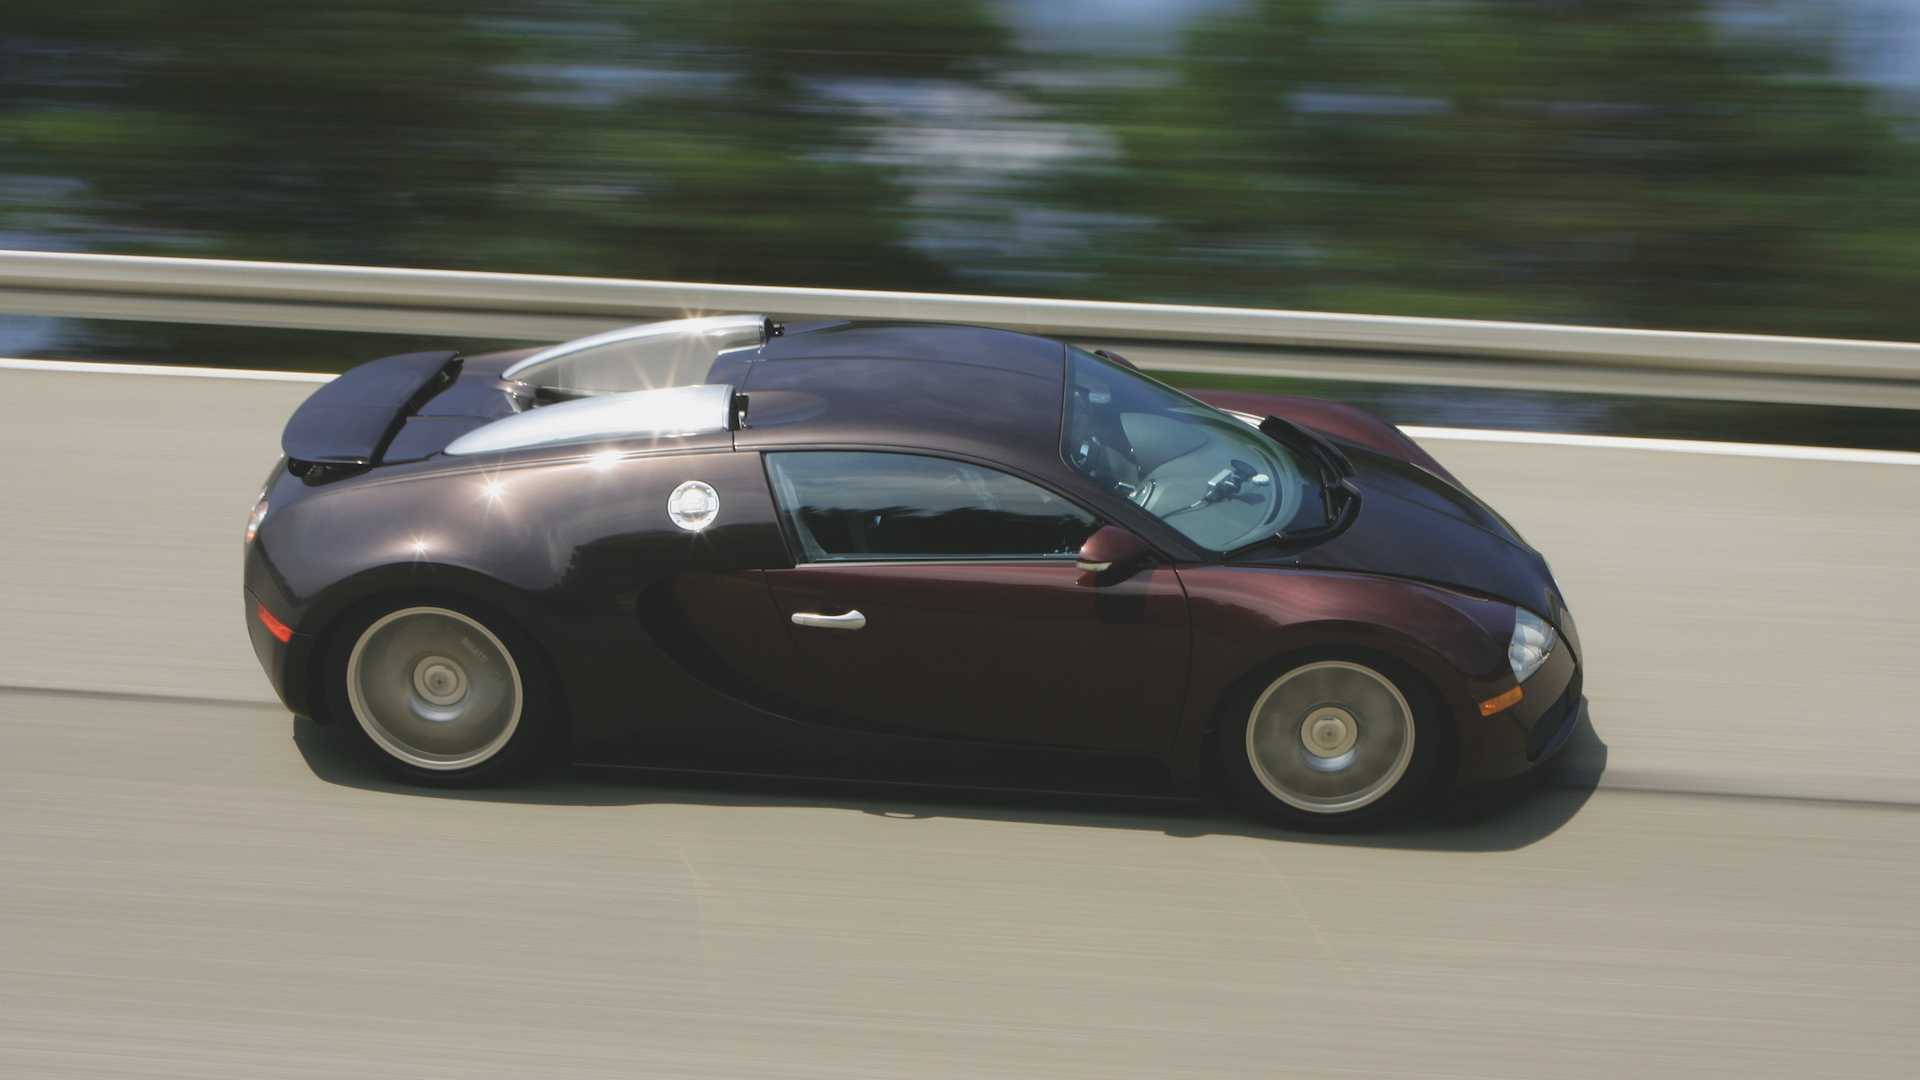 szybka jazda Bugatti Veyron